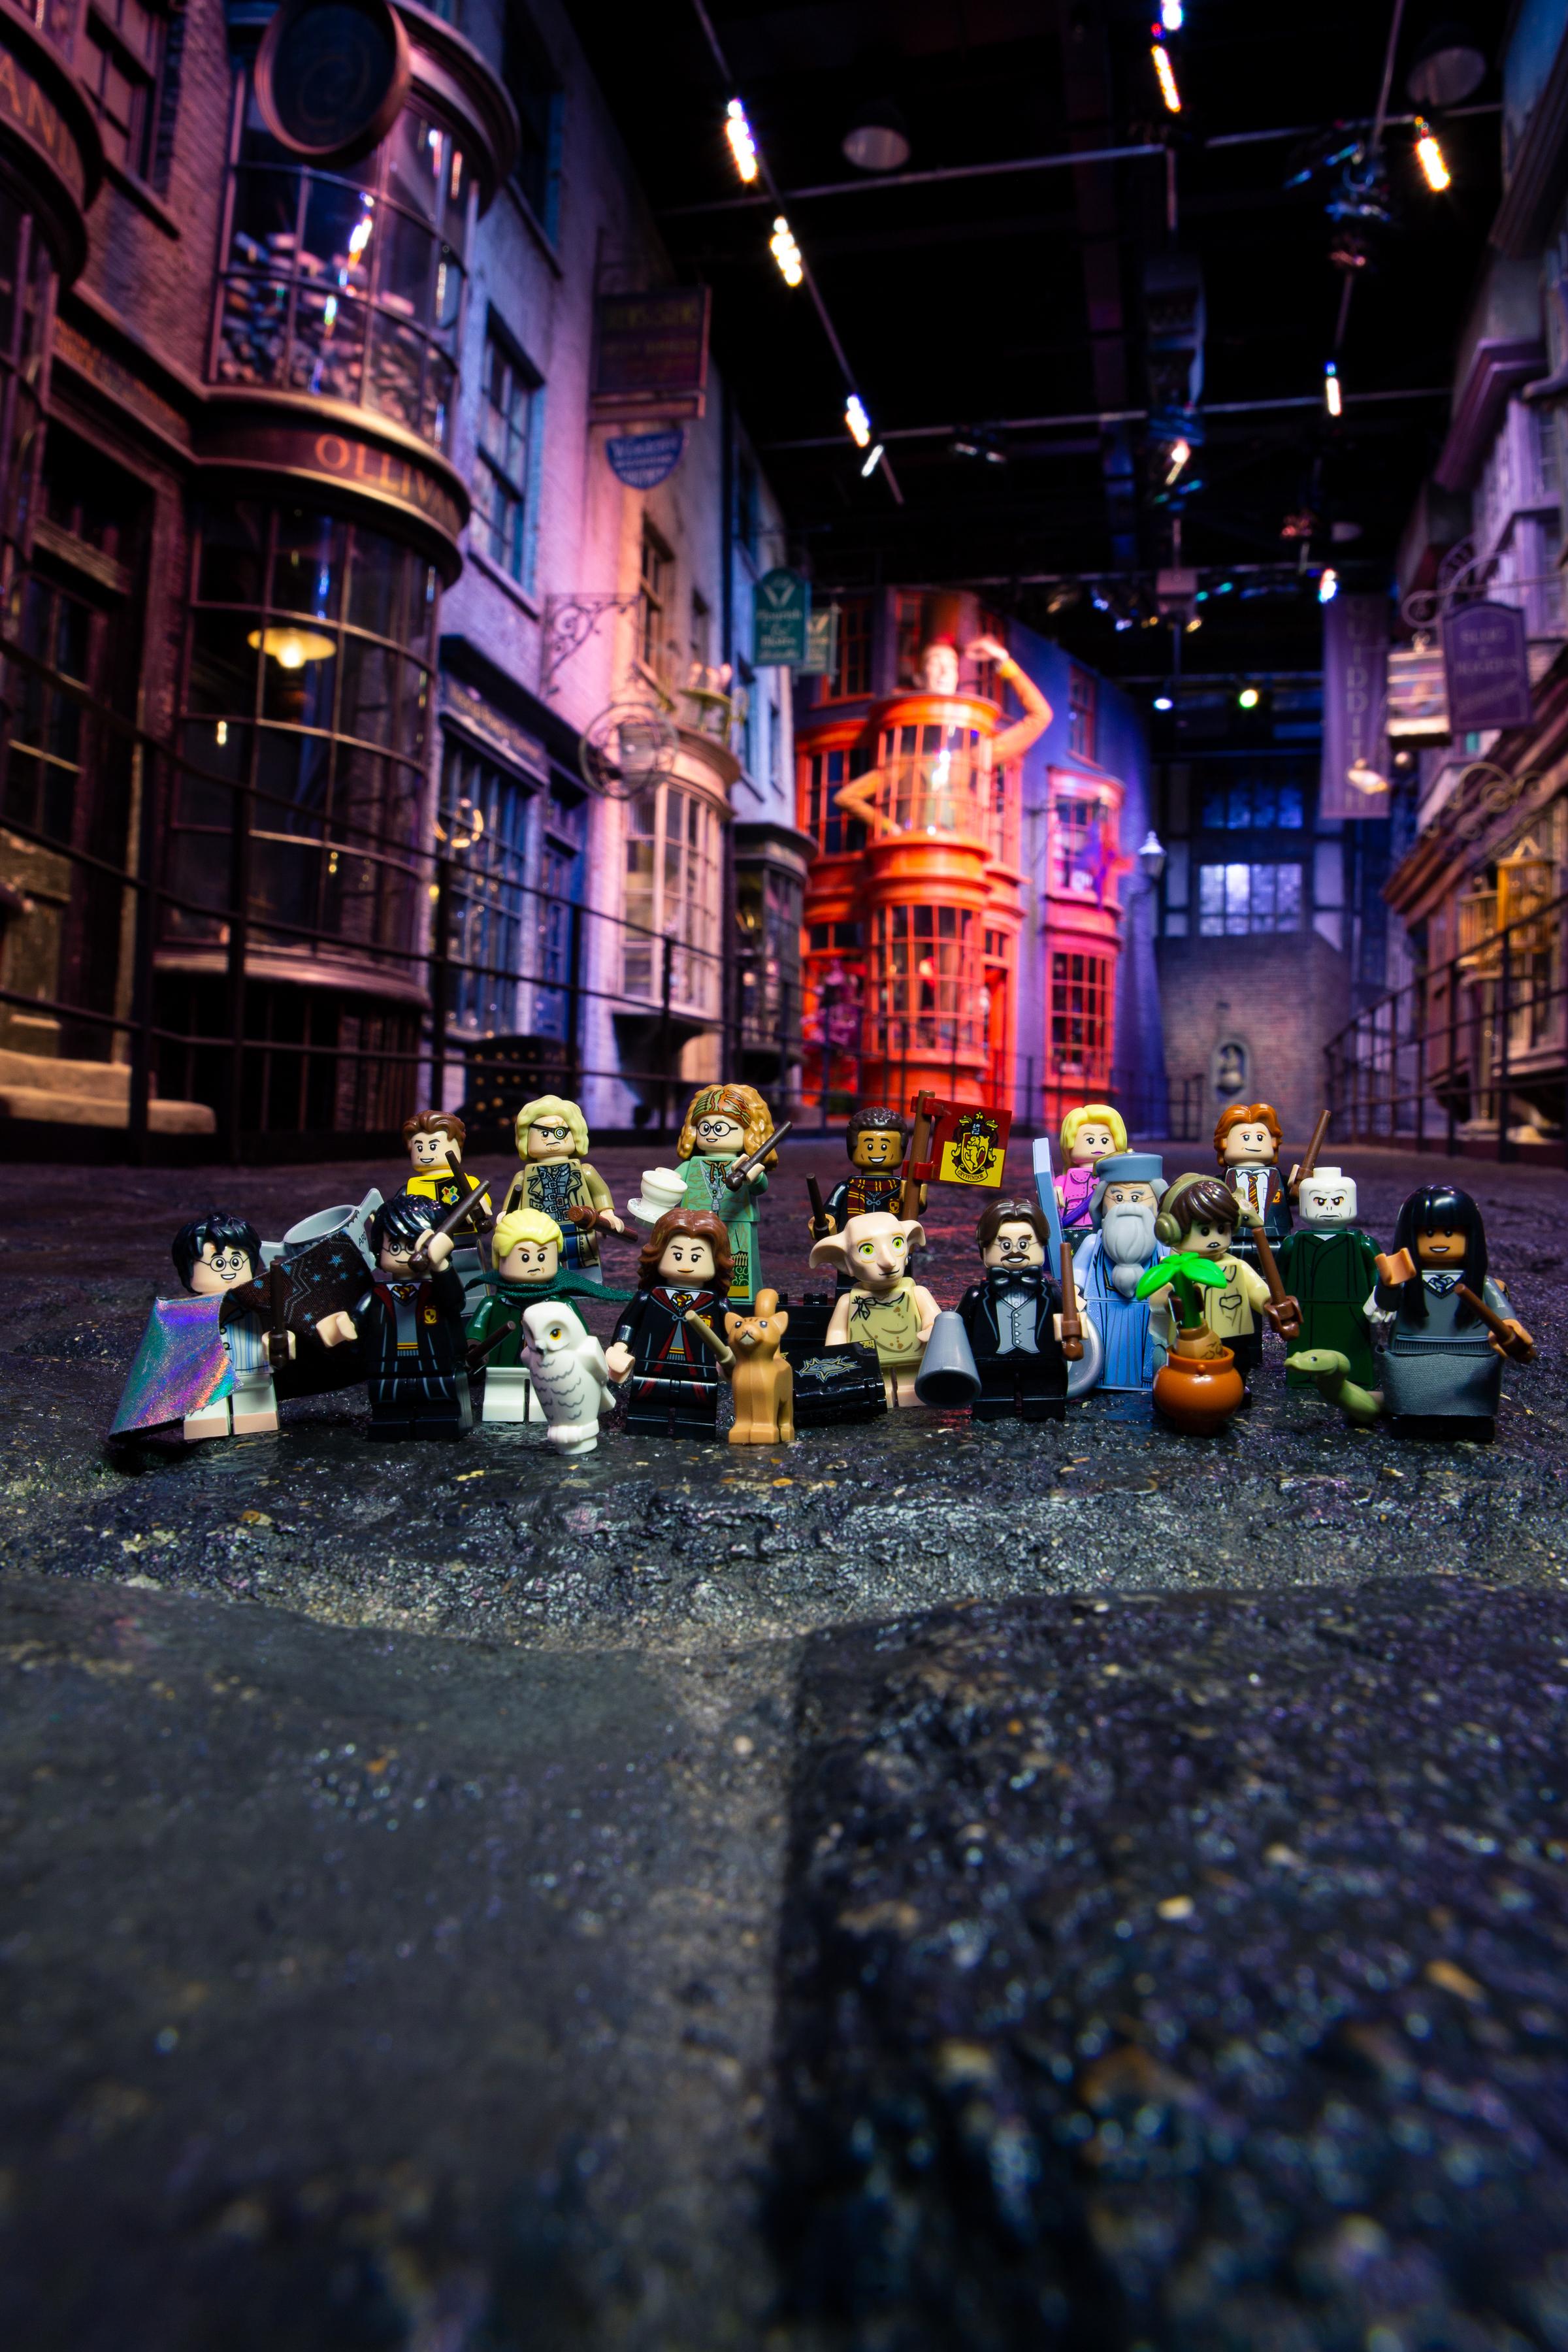 LEGO_WBST_19.06.18_hi-res-53.jpg